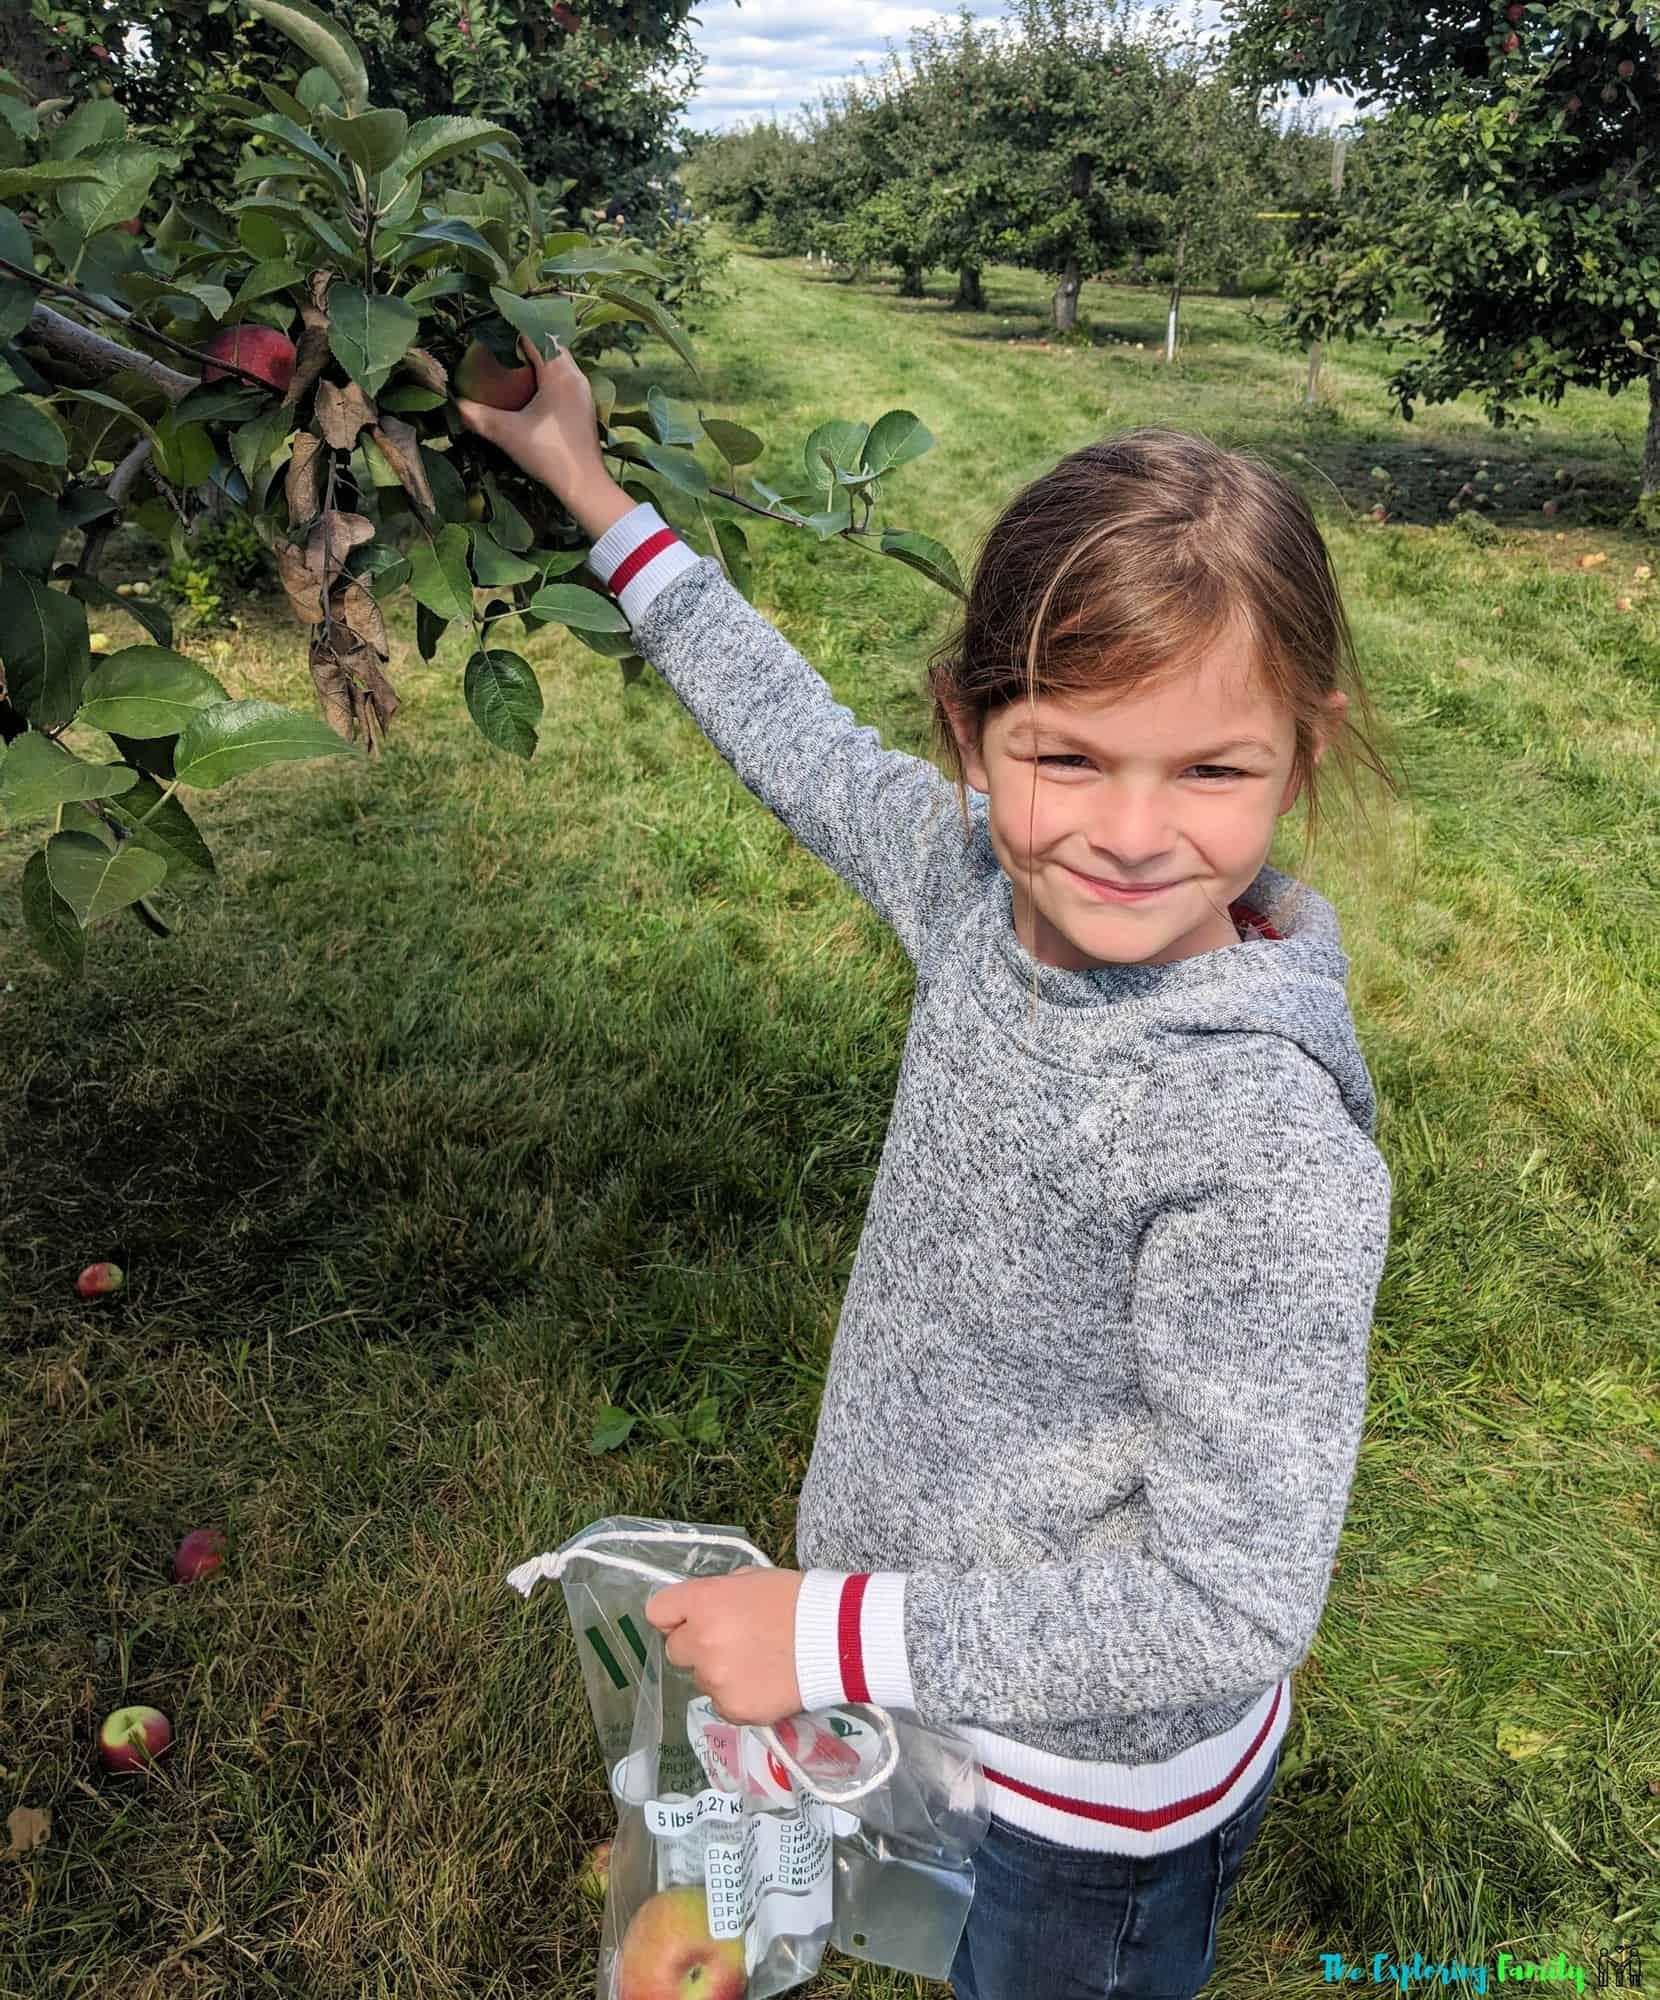 dixie orchards apple picking brampton mississauga easy for kids